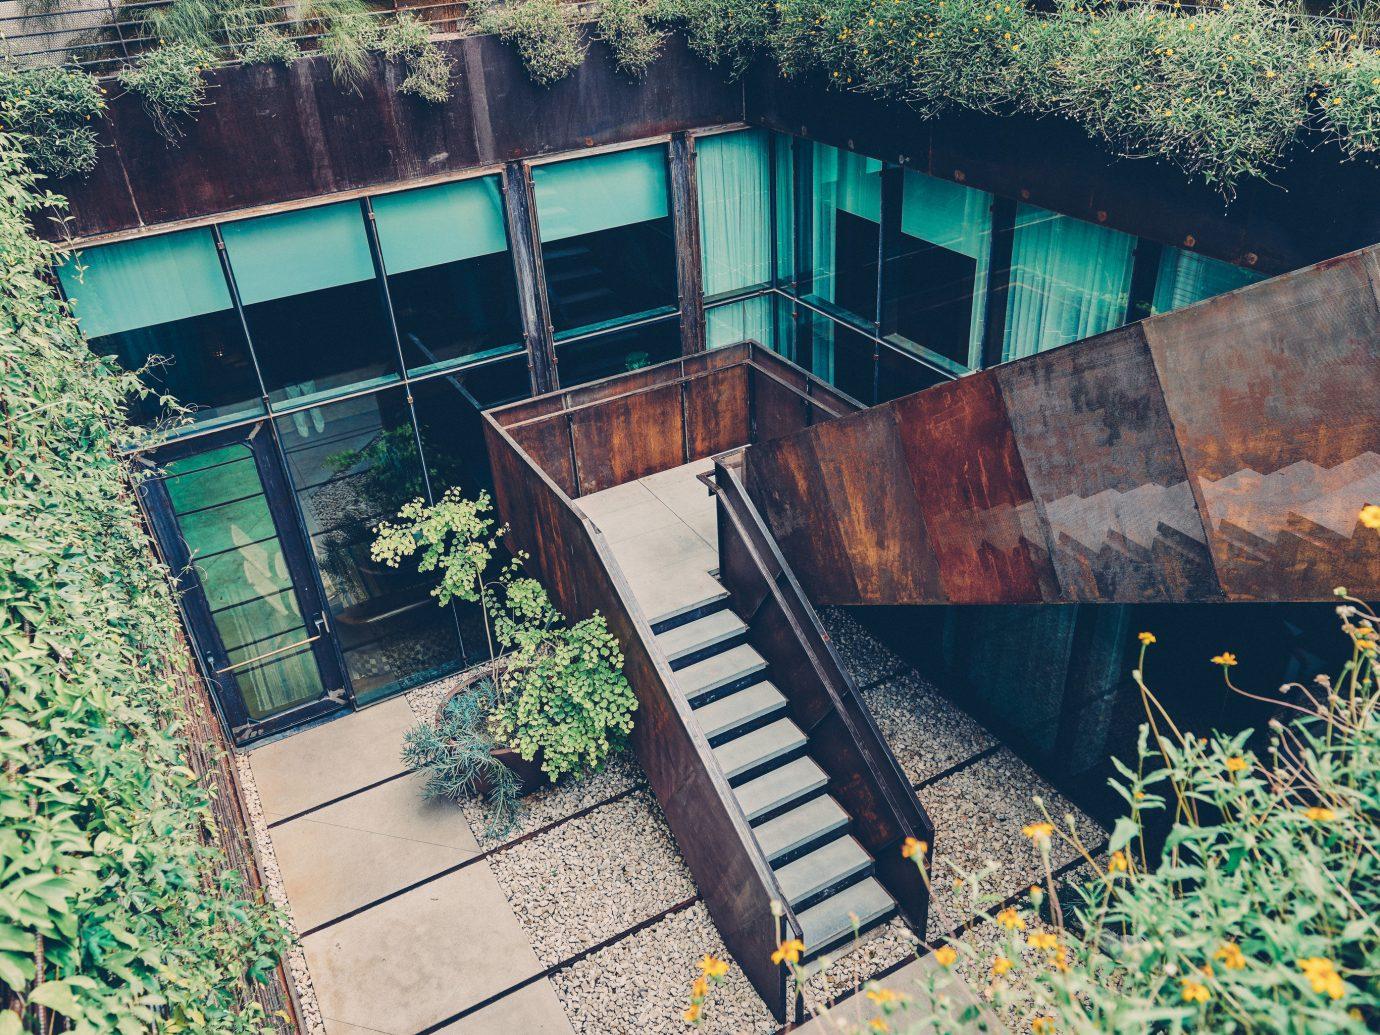 Trip Ideas tree outdoor green house building urban area wall Architecture estate home backyard waterway bridge